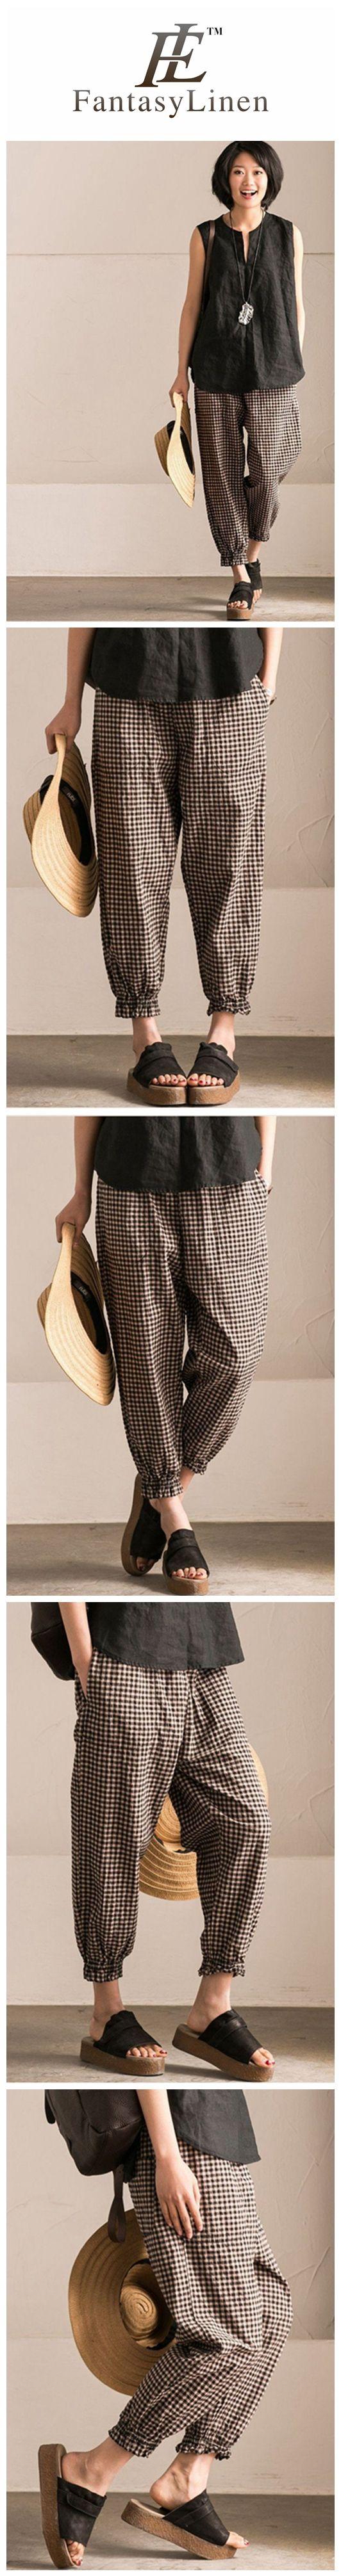 Art Casual Black White Grid Pants Cotton Women Clothes K9653B   K9653B